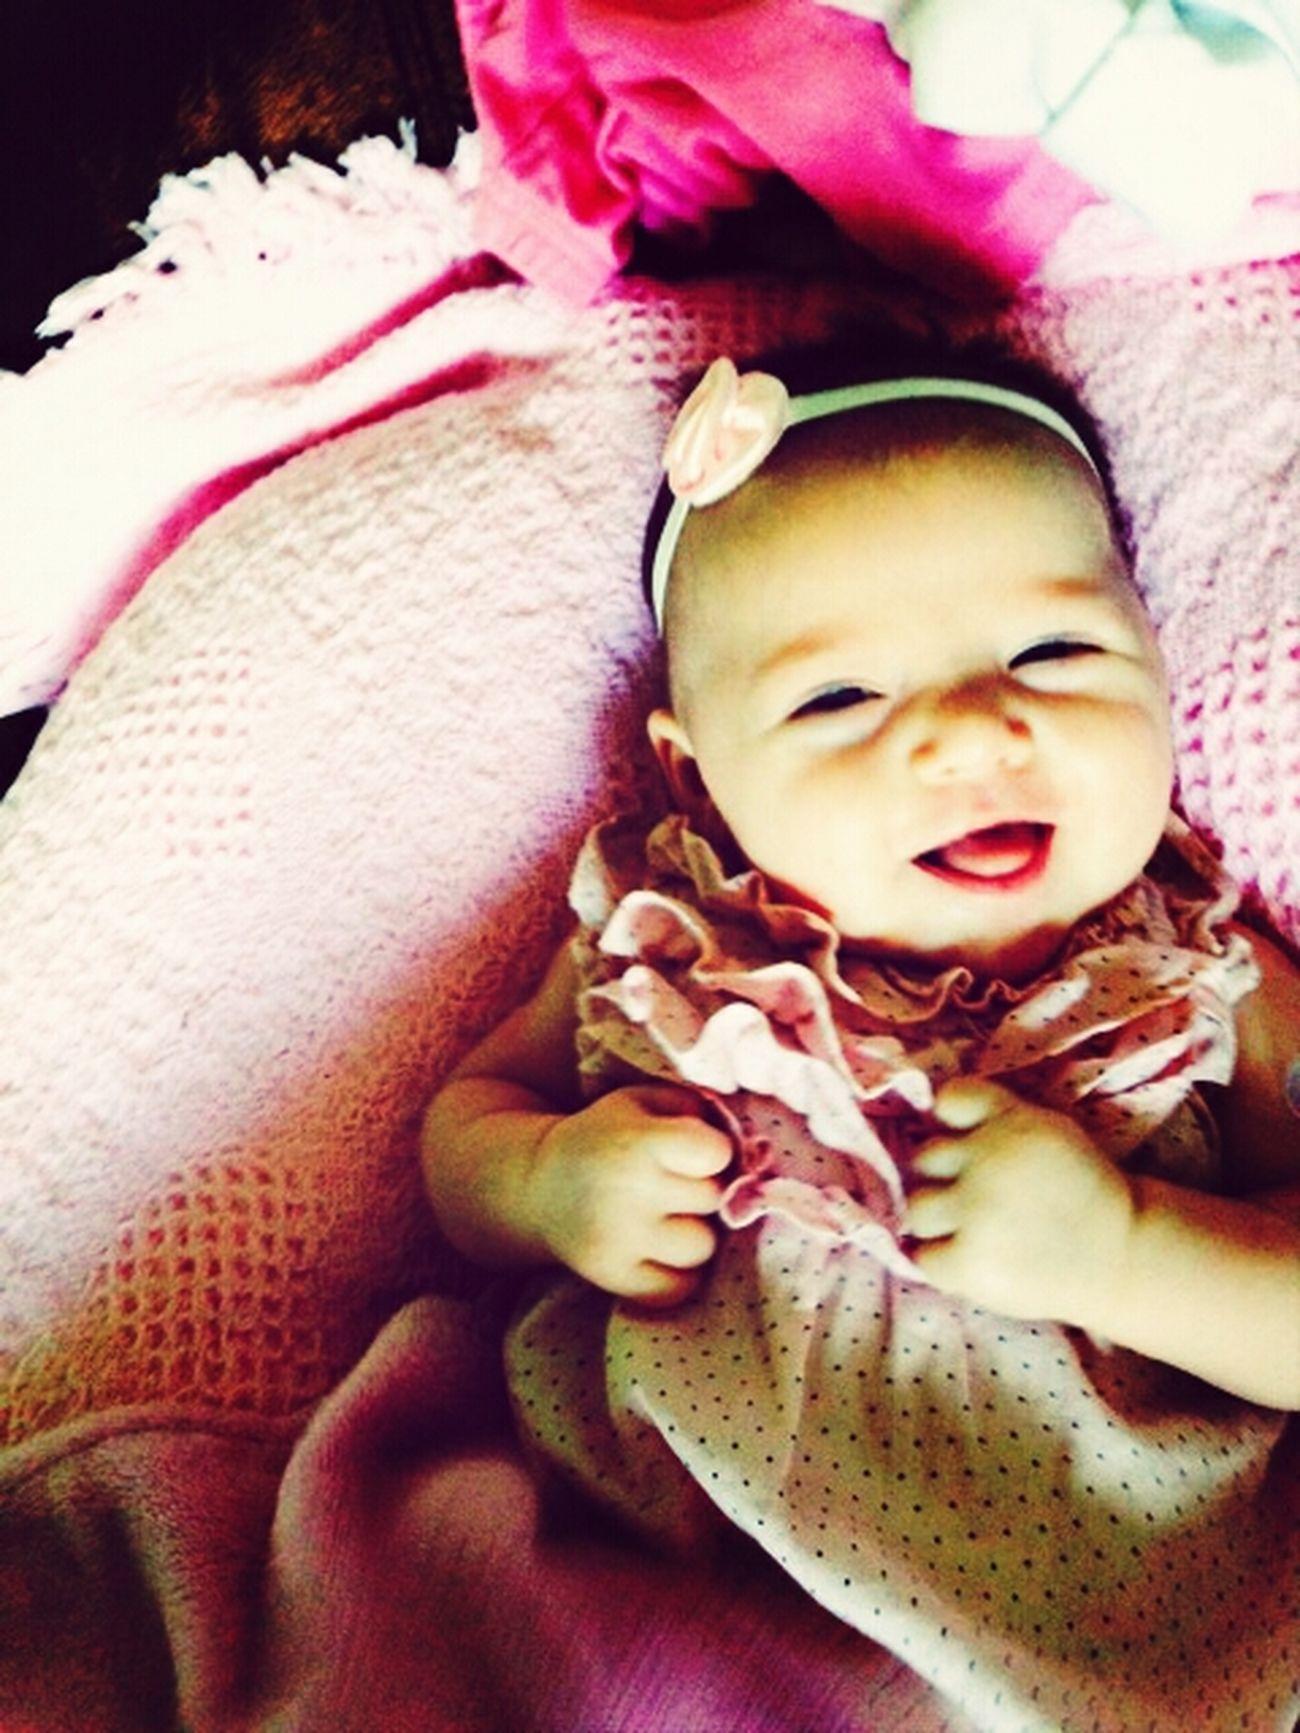 Happy Baby Smile. Eva♥ Mommys Princess